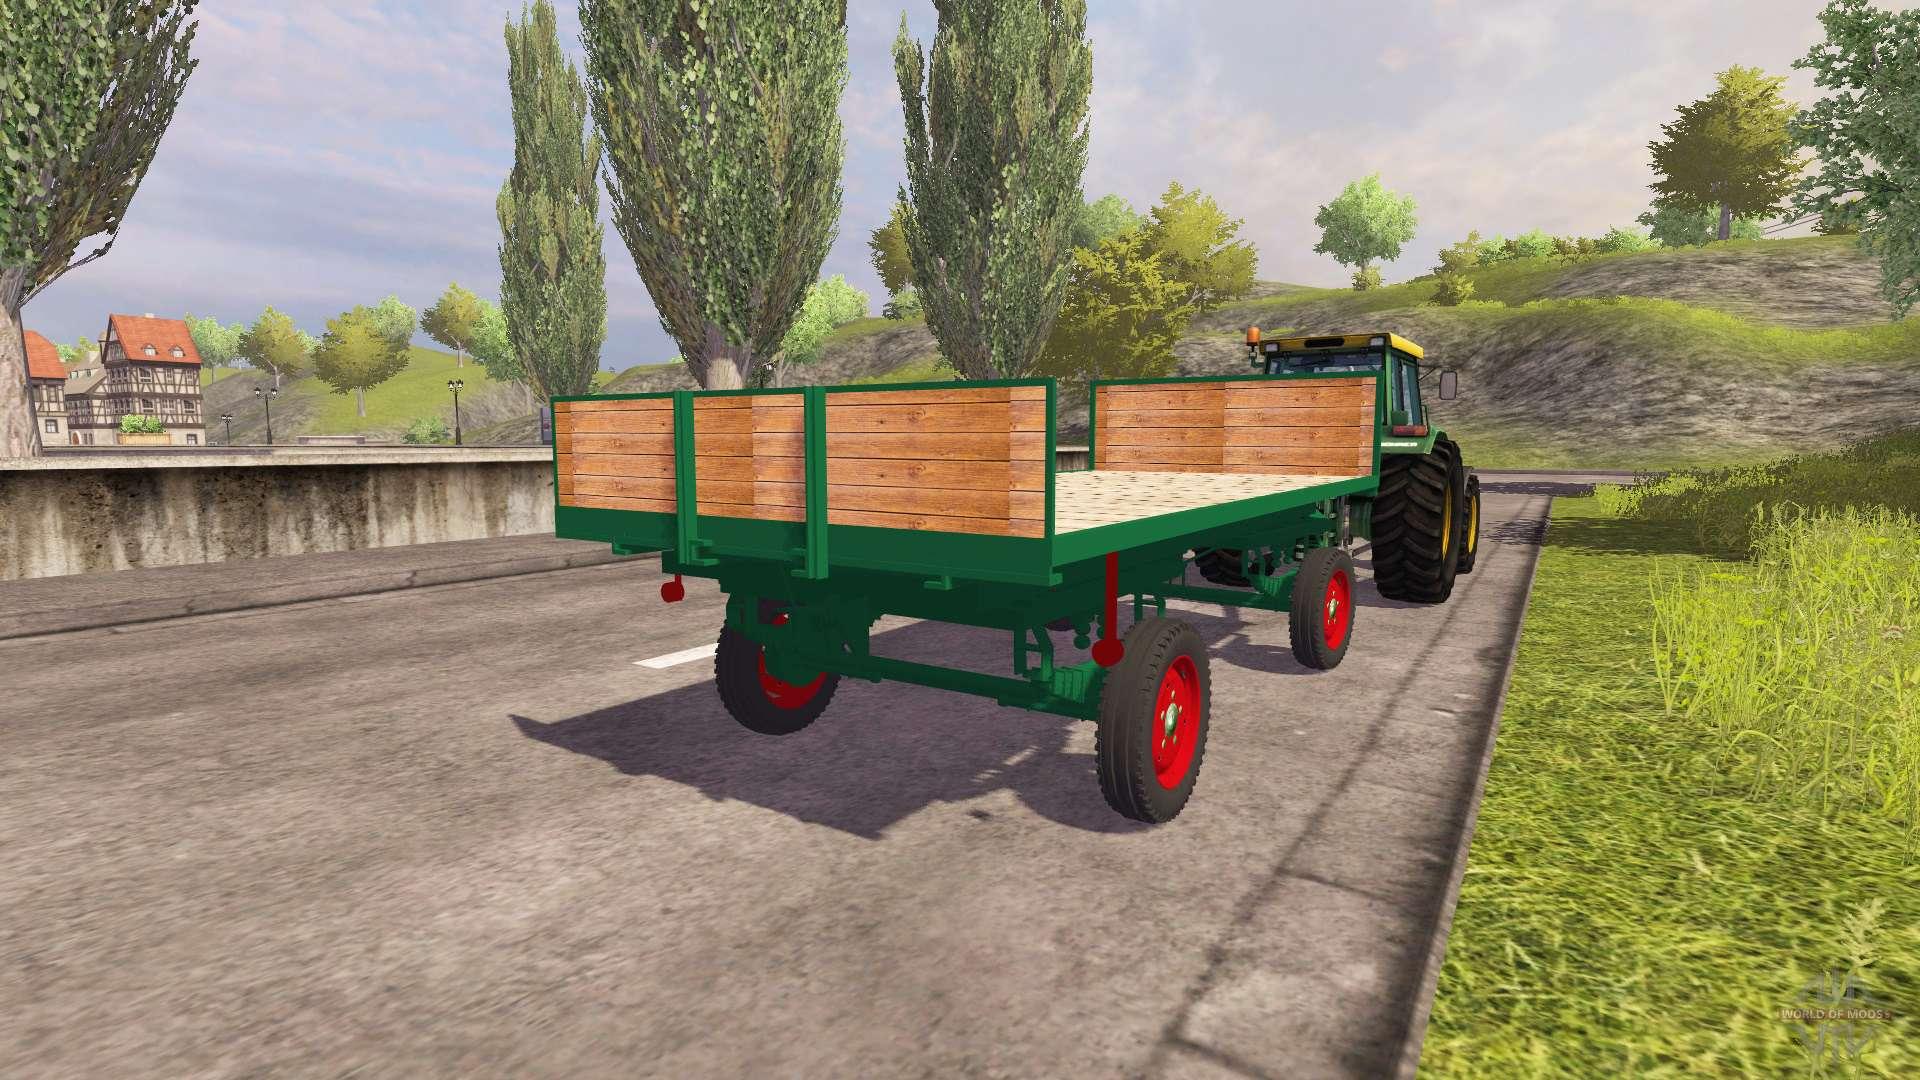 Trailer de bale para Farming Simulator 2013. Clásico de remolque para